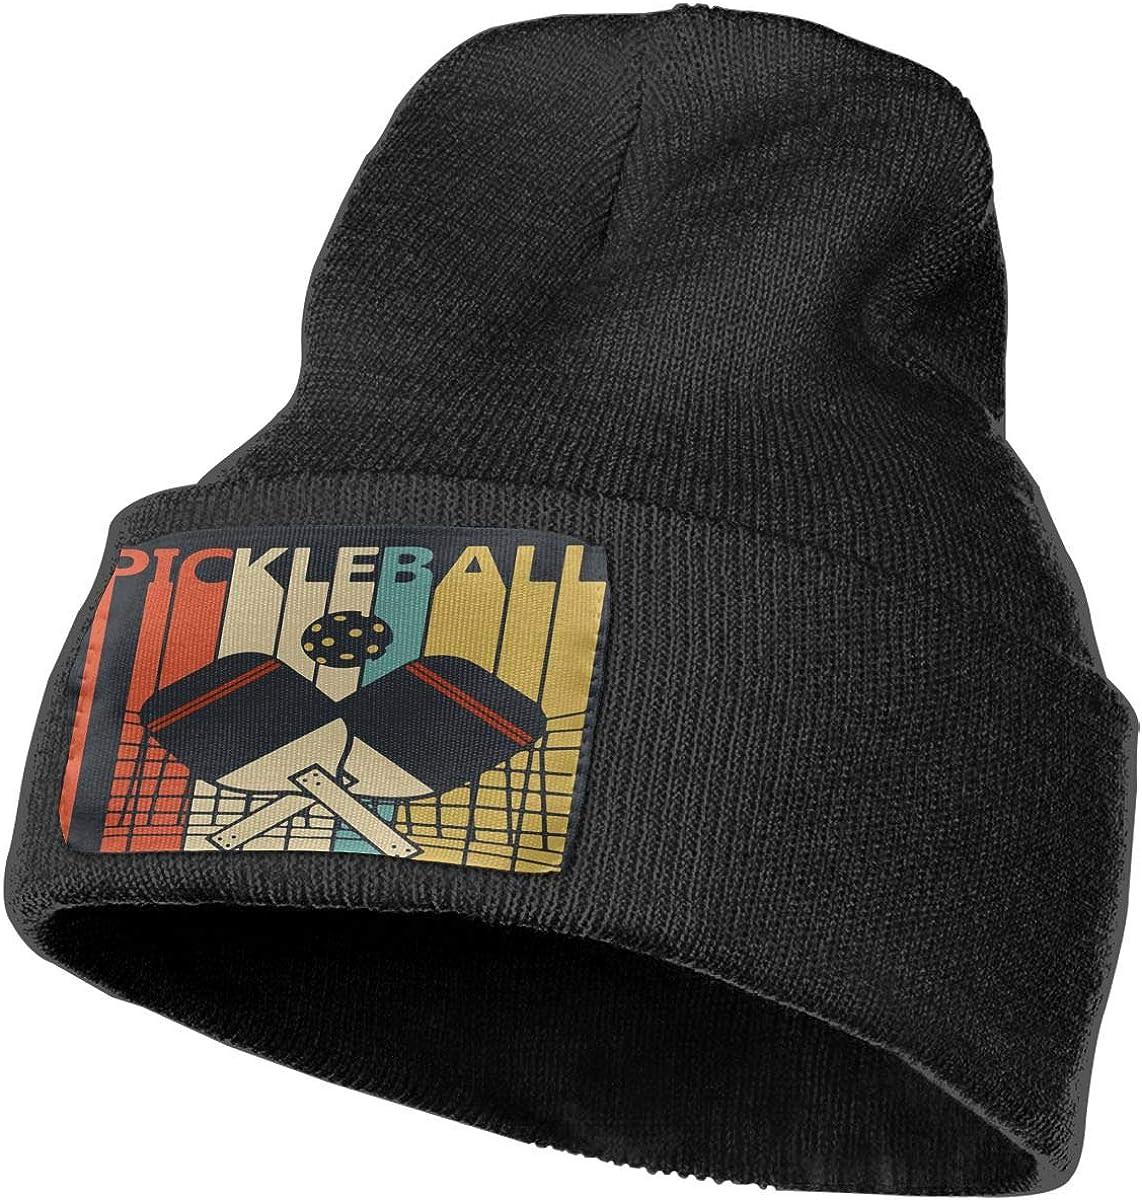 Vintage Retro Pickleball Women and Men Skull Caps Winter Warm Stretchy Knitting Beanie Hats